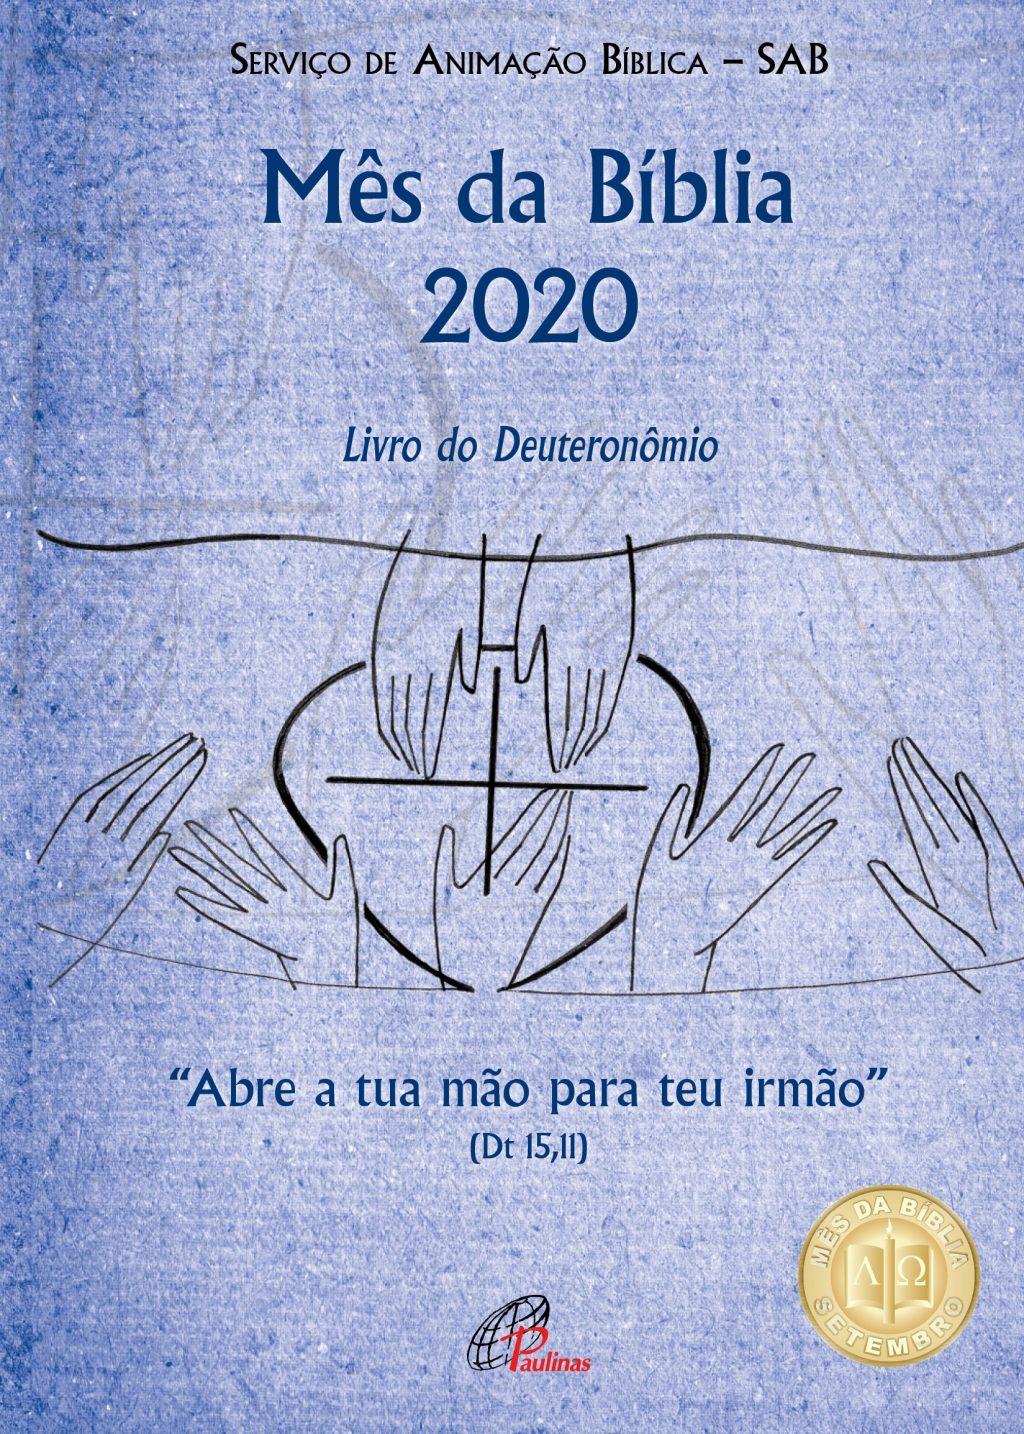 Subsídio do Mês da Bíblia 2020